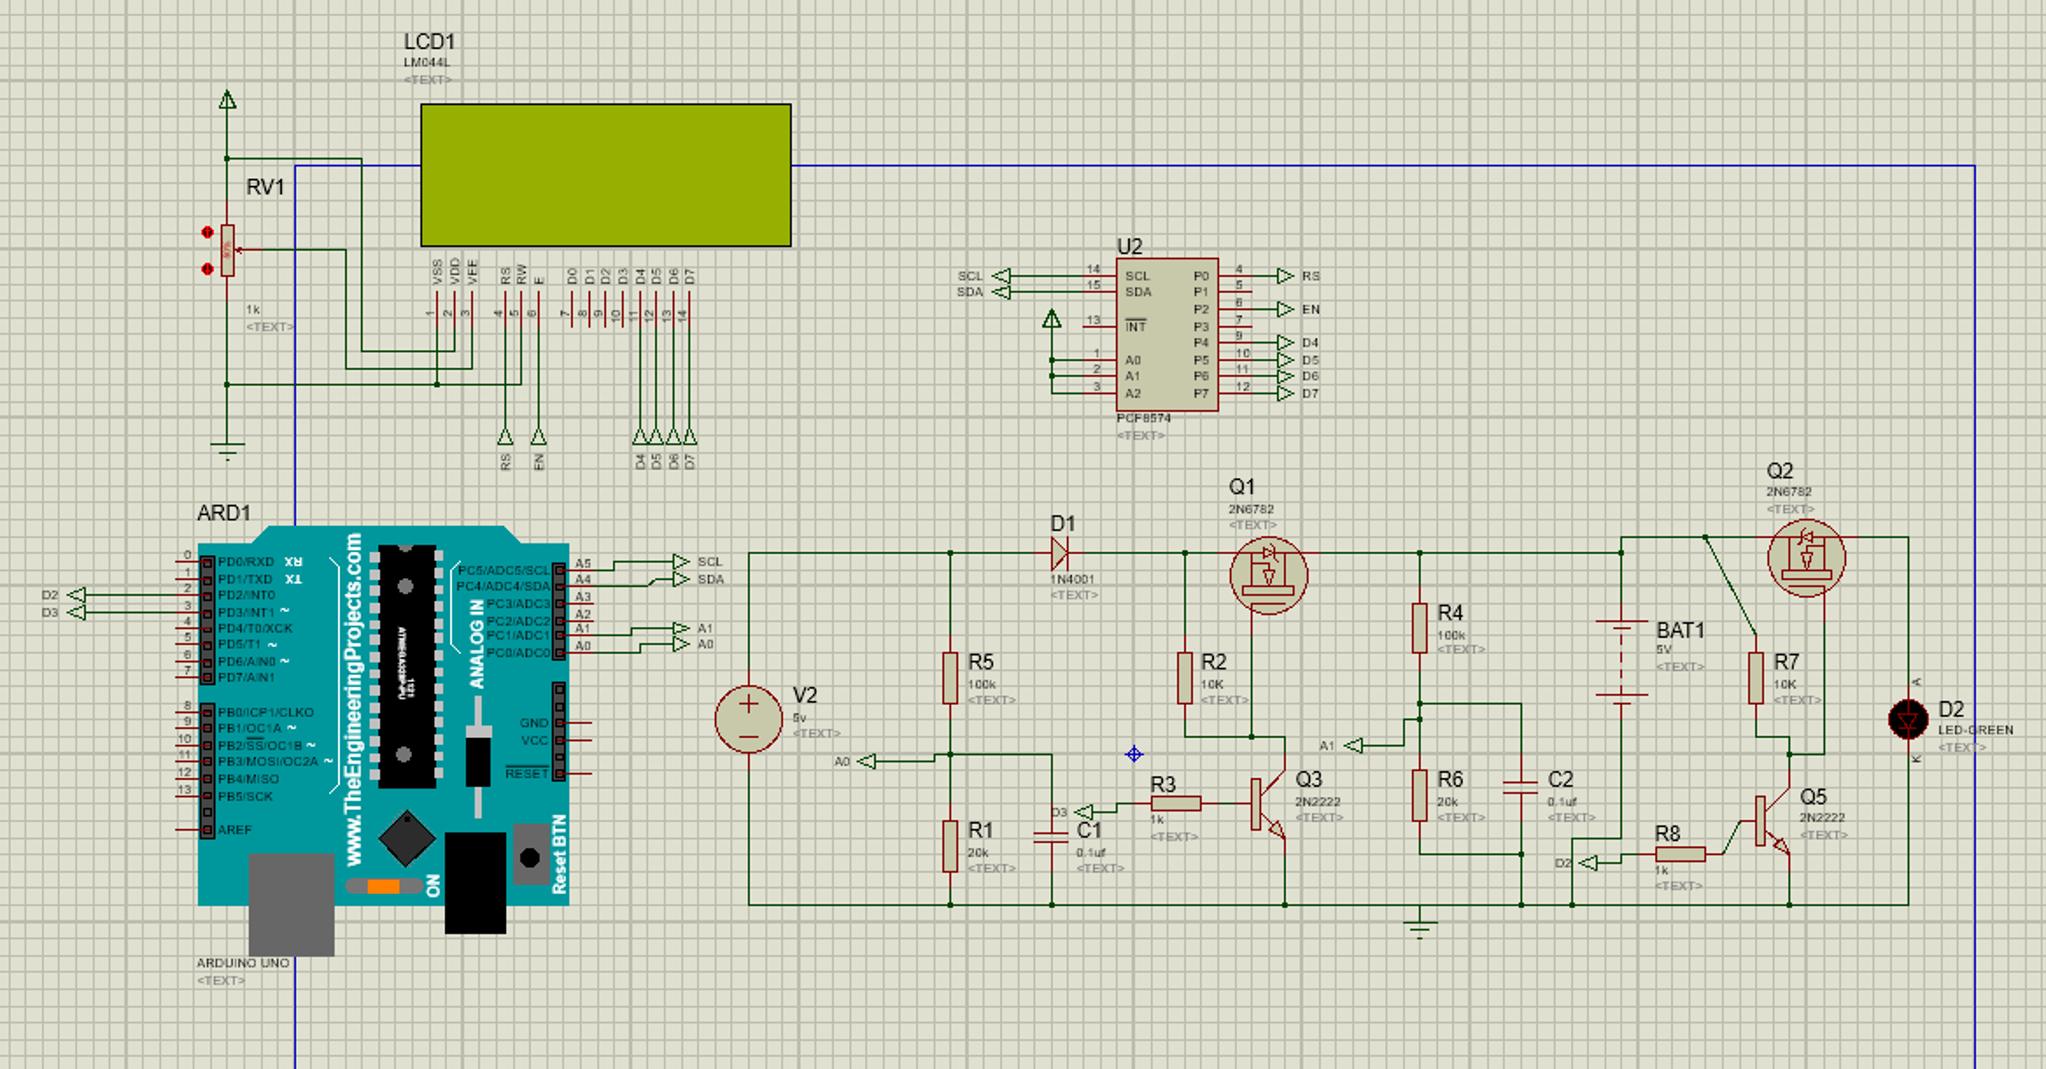 Proteus arduino i did the design circuit in hard